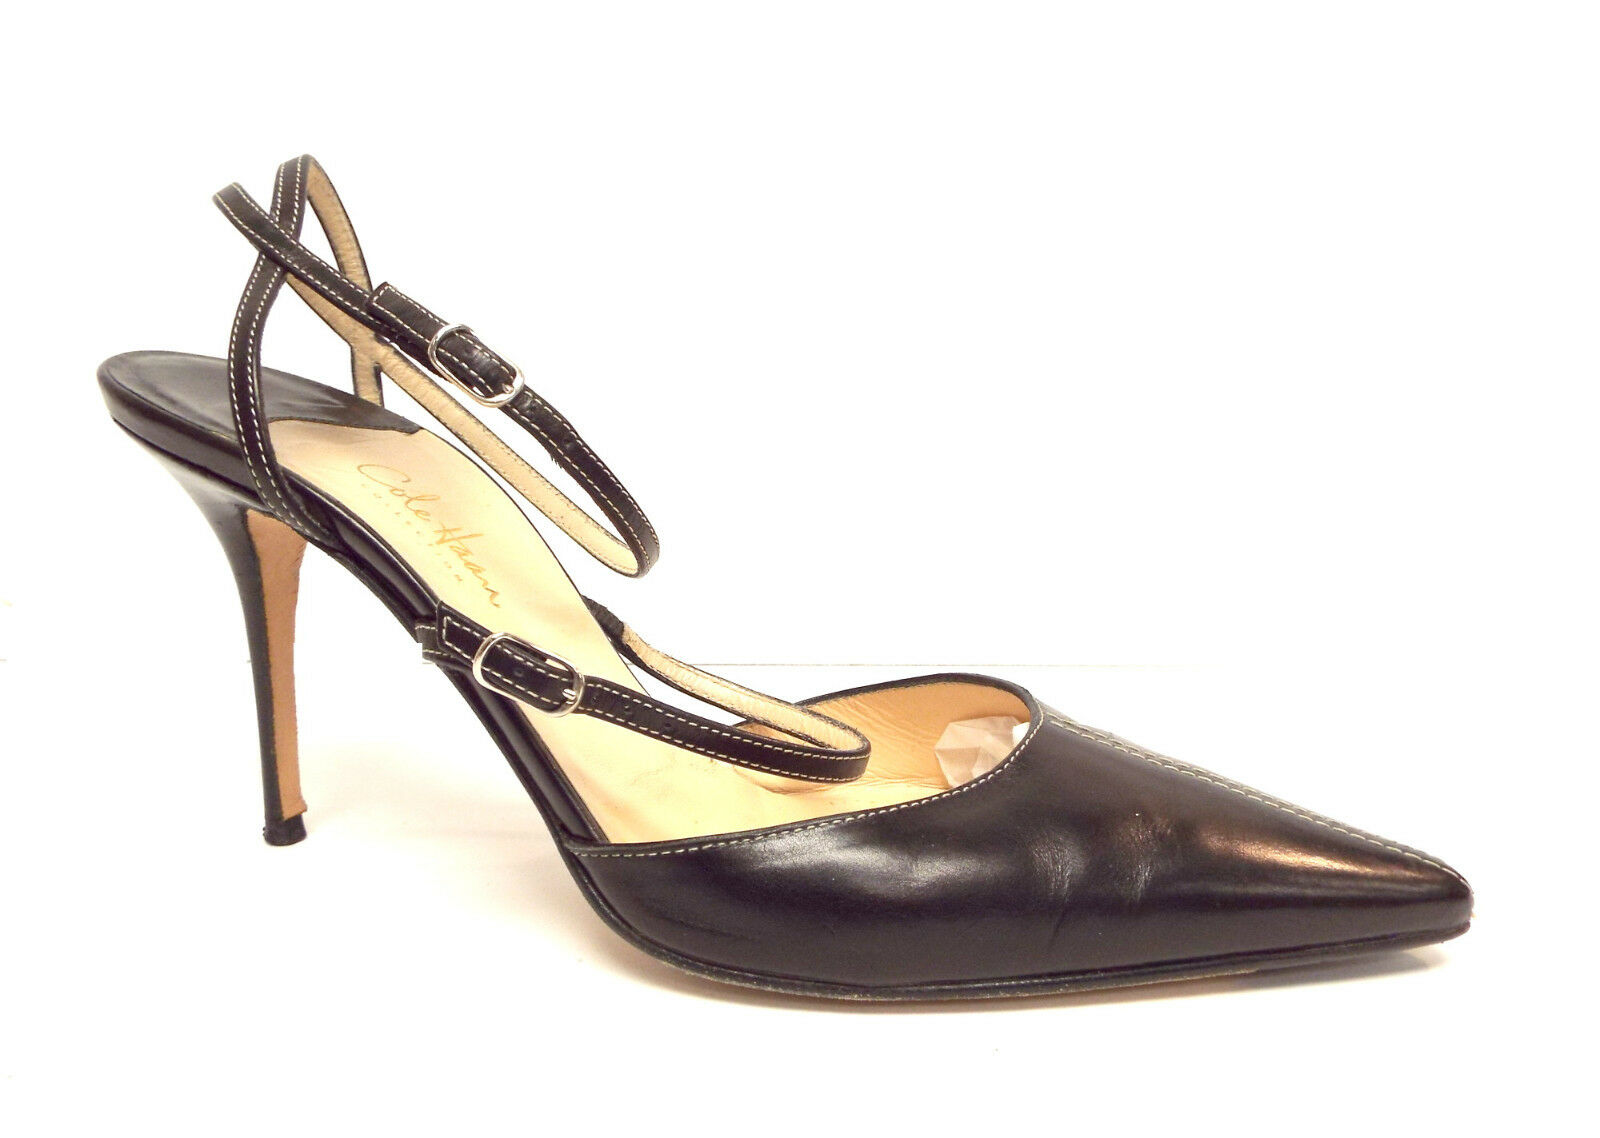 COLE HAAN Size 8.5 Black Leather Ankle Strap Heels Pumps shoes 8 1 2